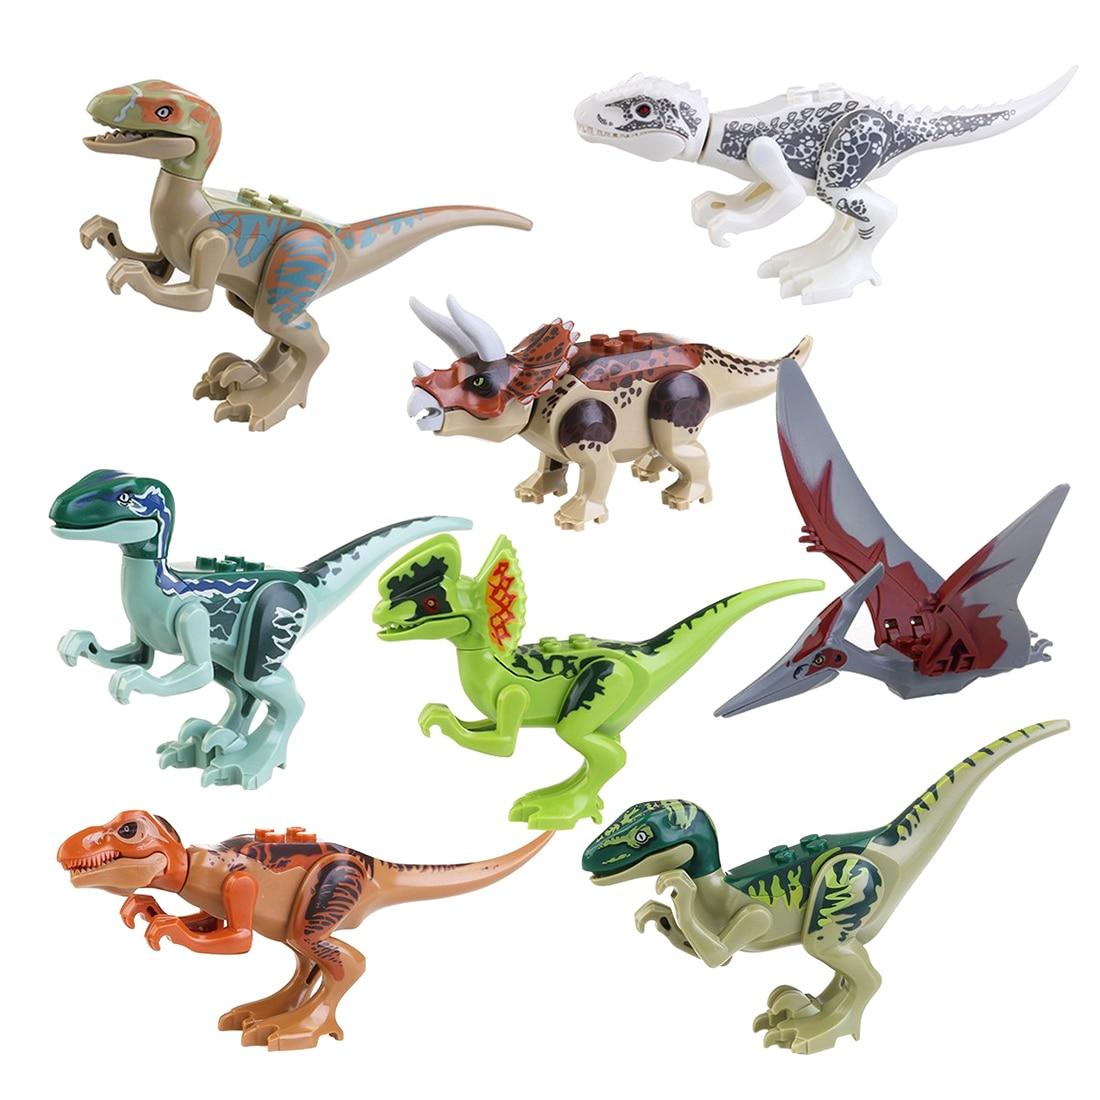 Jurassic Building Blocks Park Dinosaur Toys Jurassic World Dinosaur Toys - 8pcs мастурбатор nano toys nano